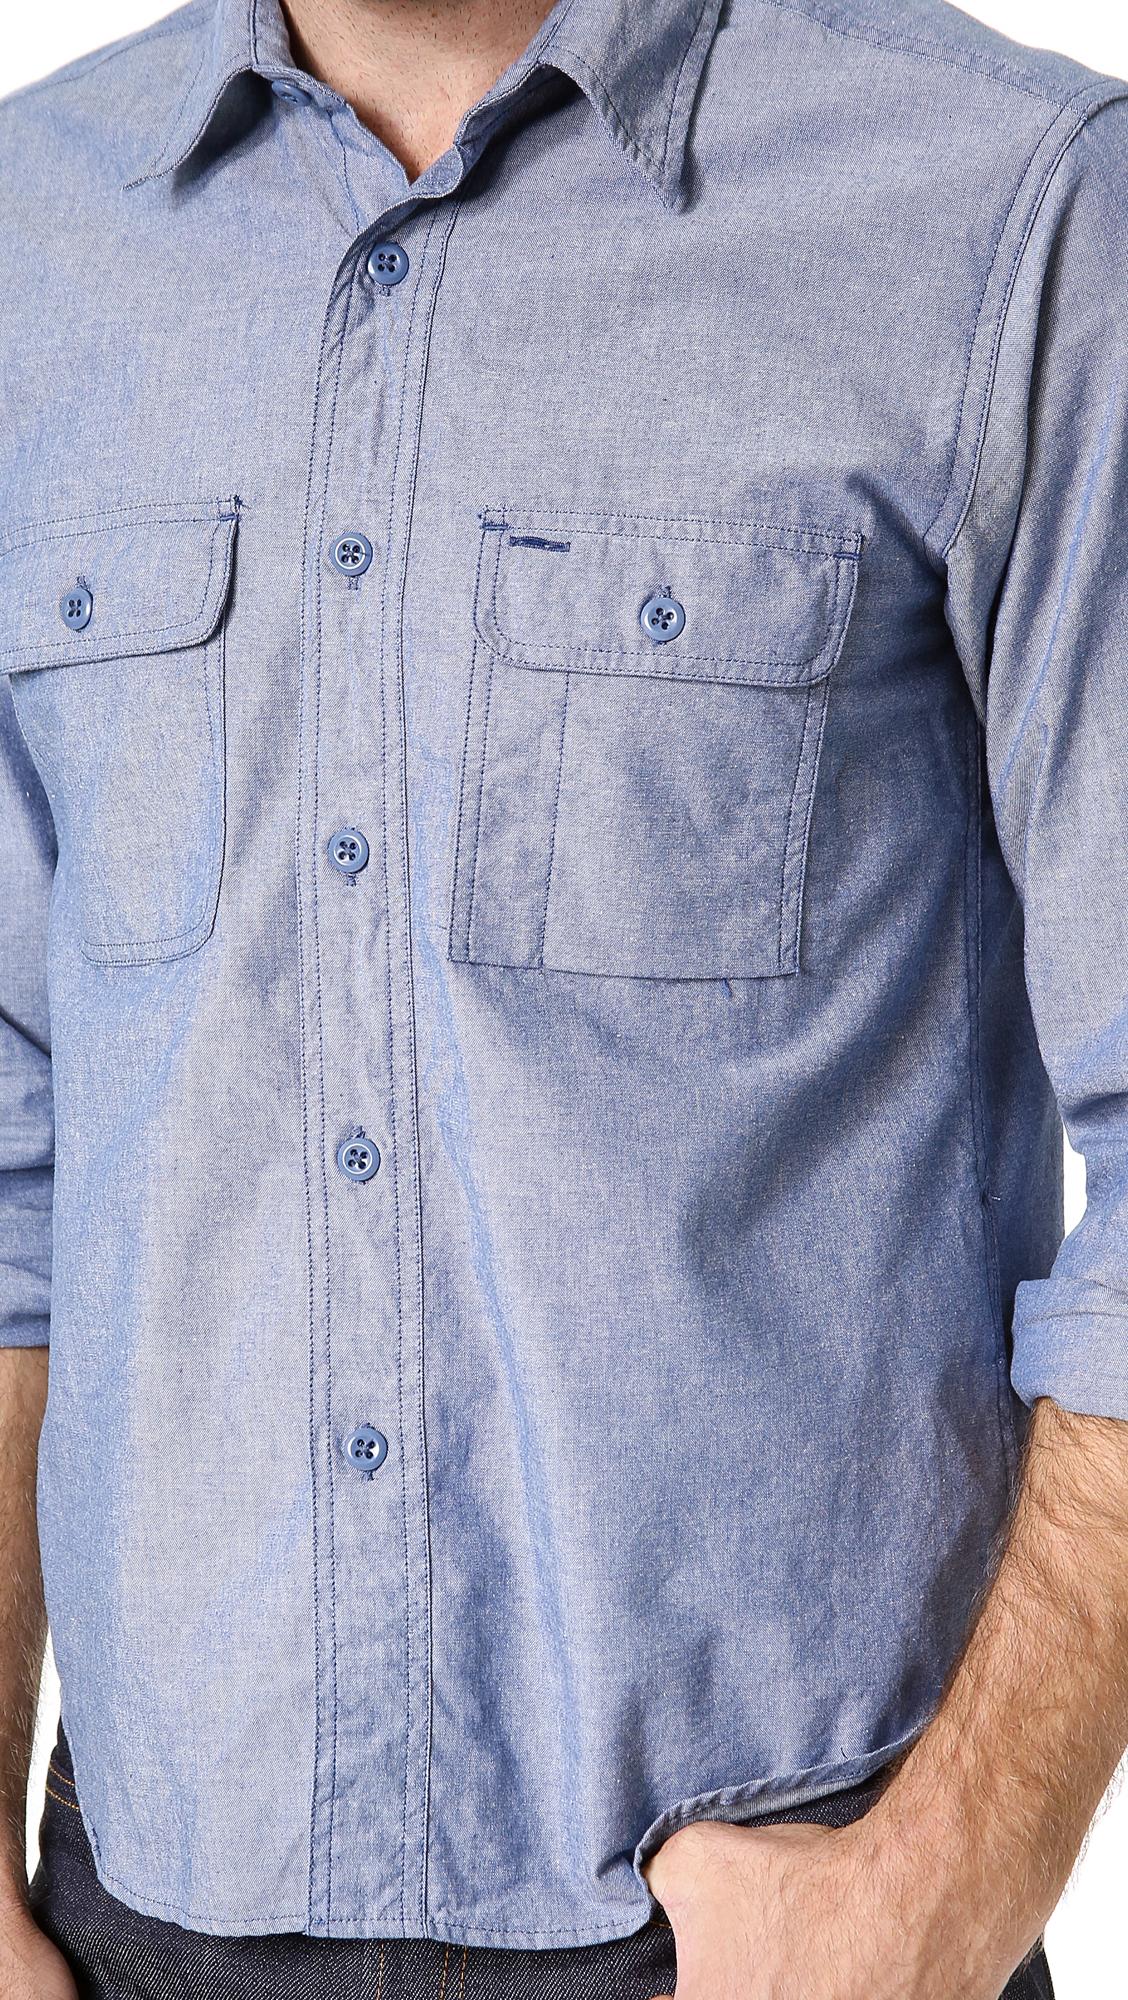 Lyst battenwear chambray work shirt in blue for men for Light blue work shirt